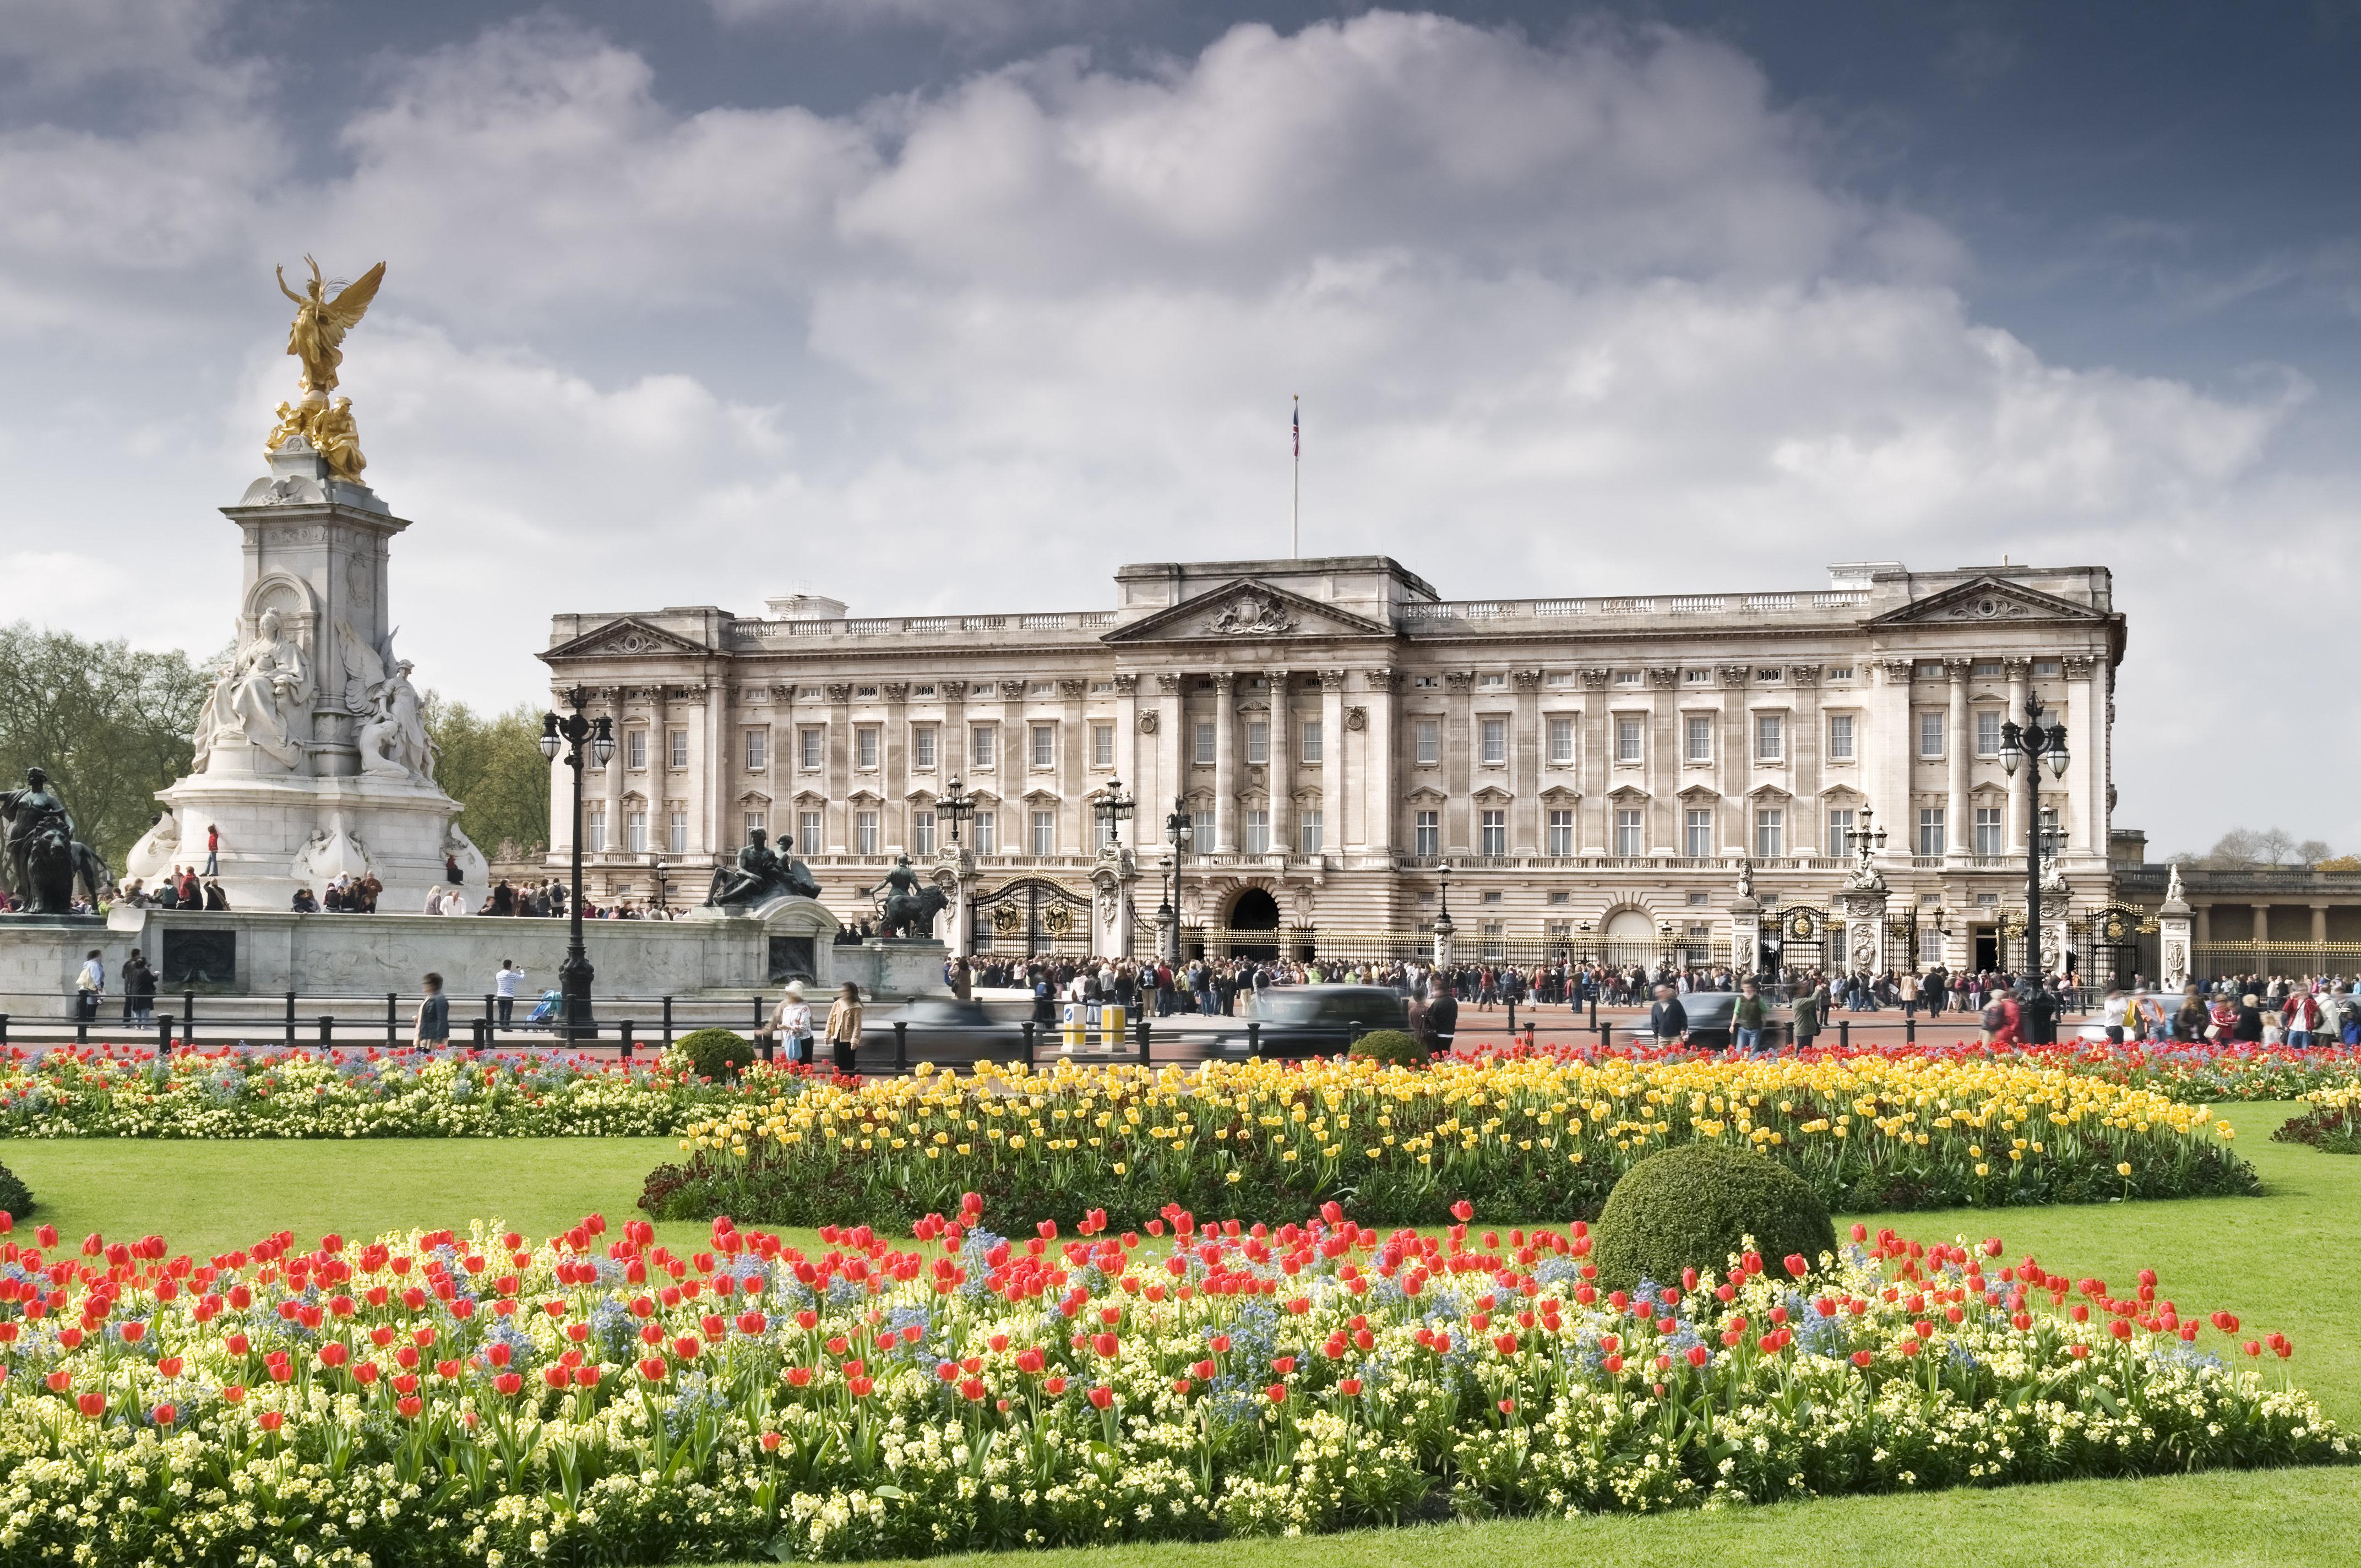 Man Released After Being Arrested At Buckingham Palace Over 'Taser